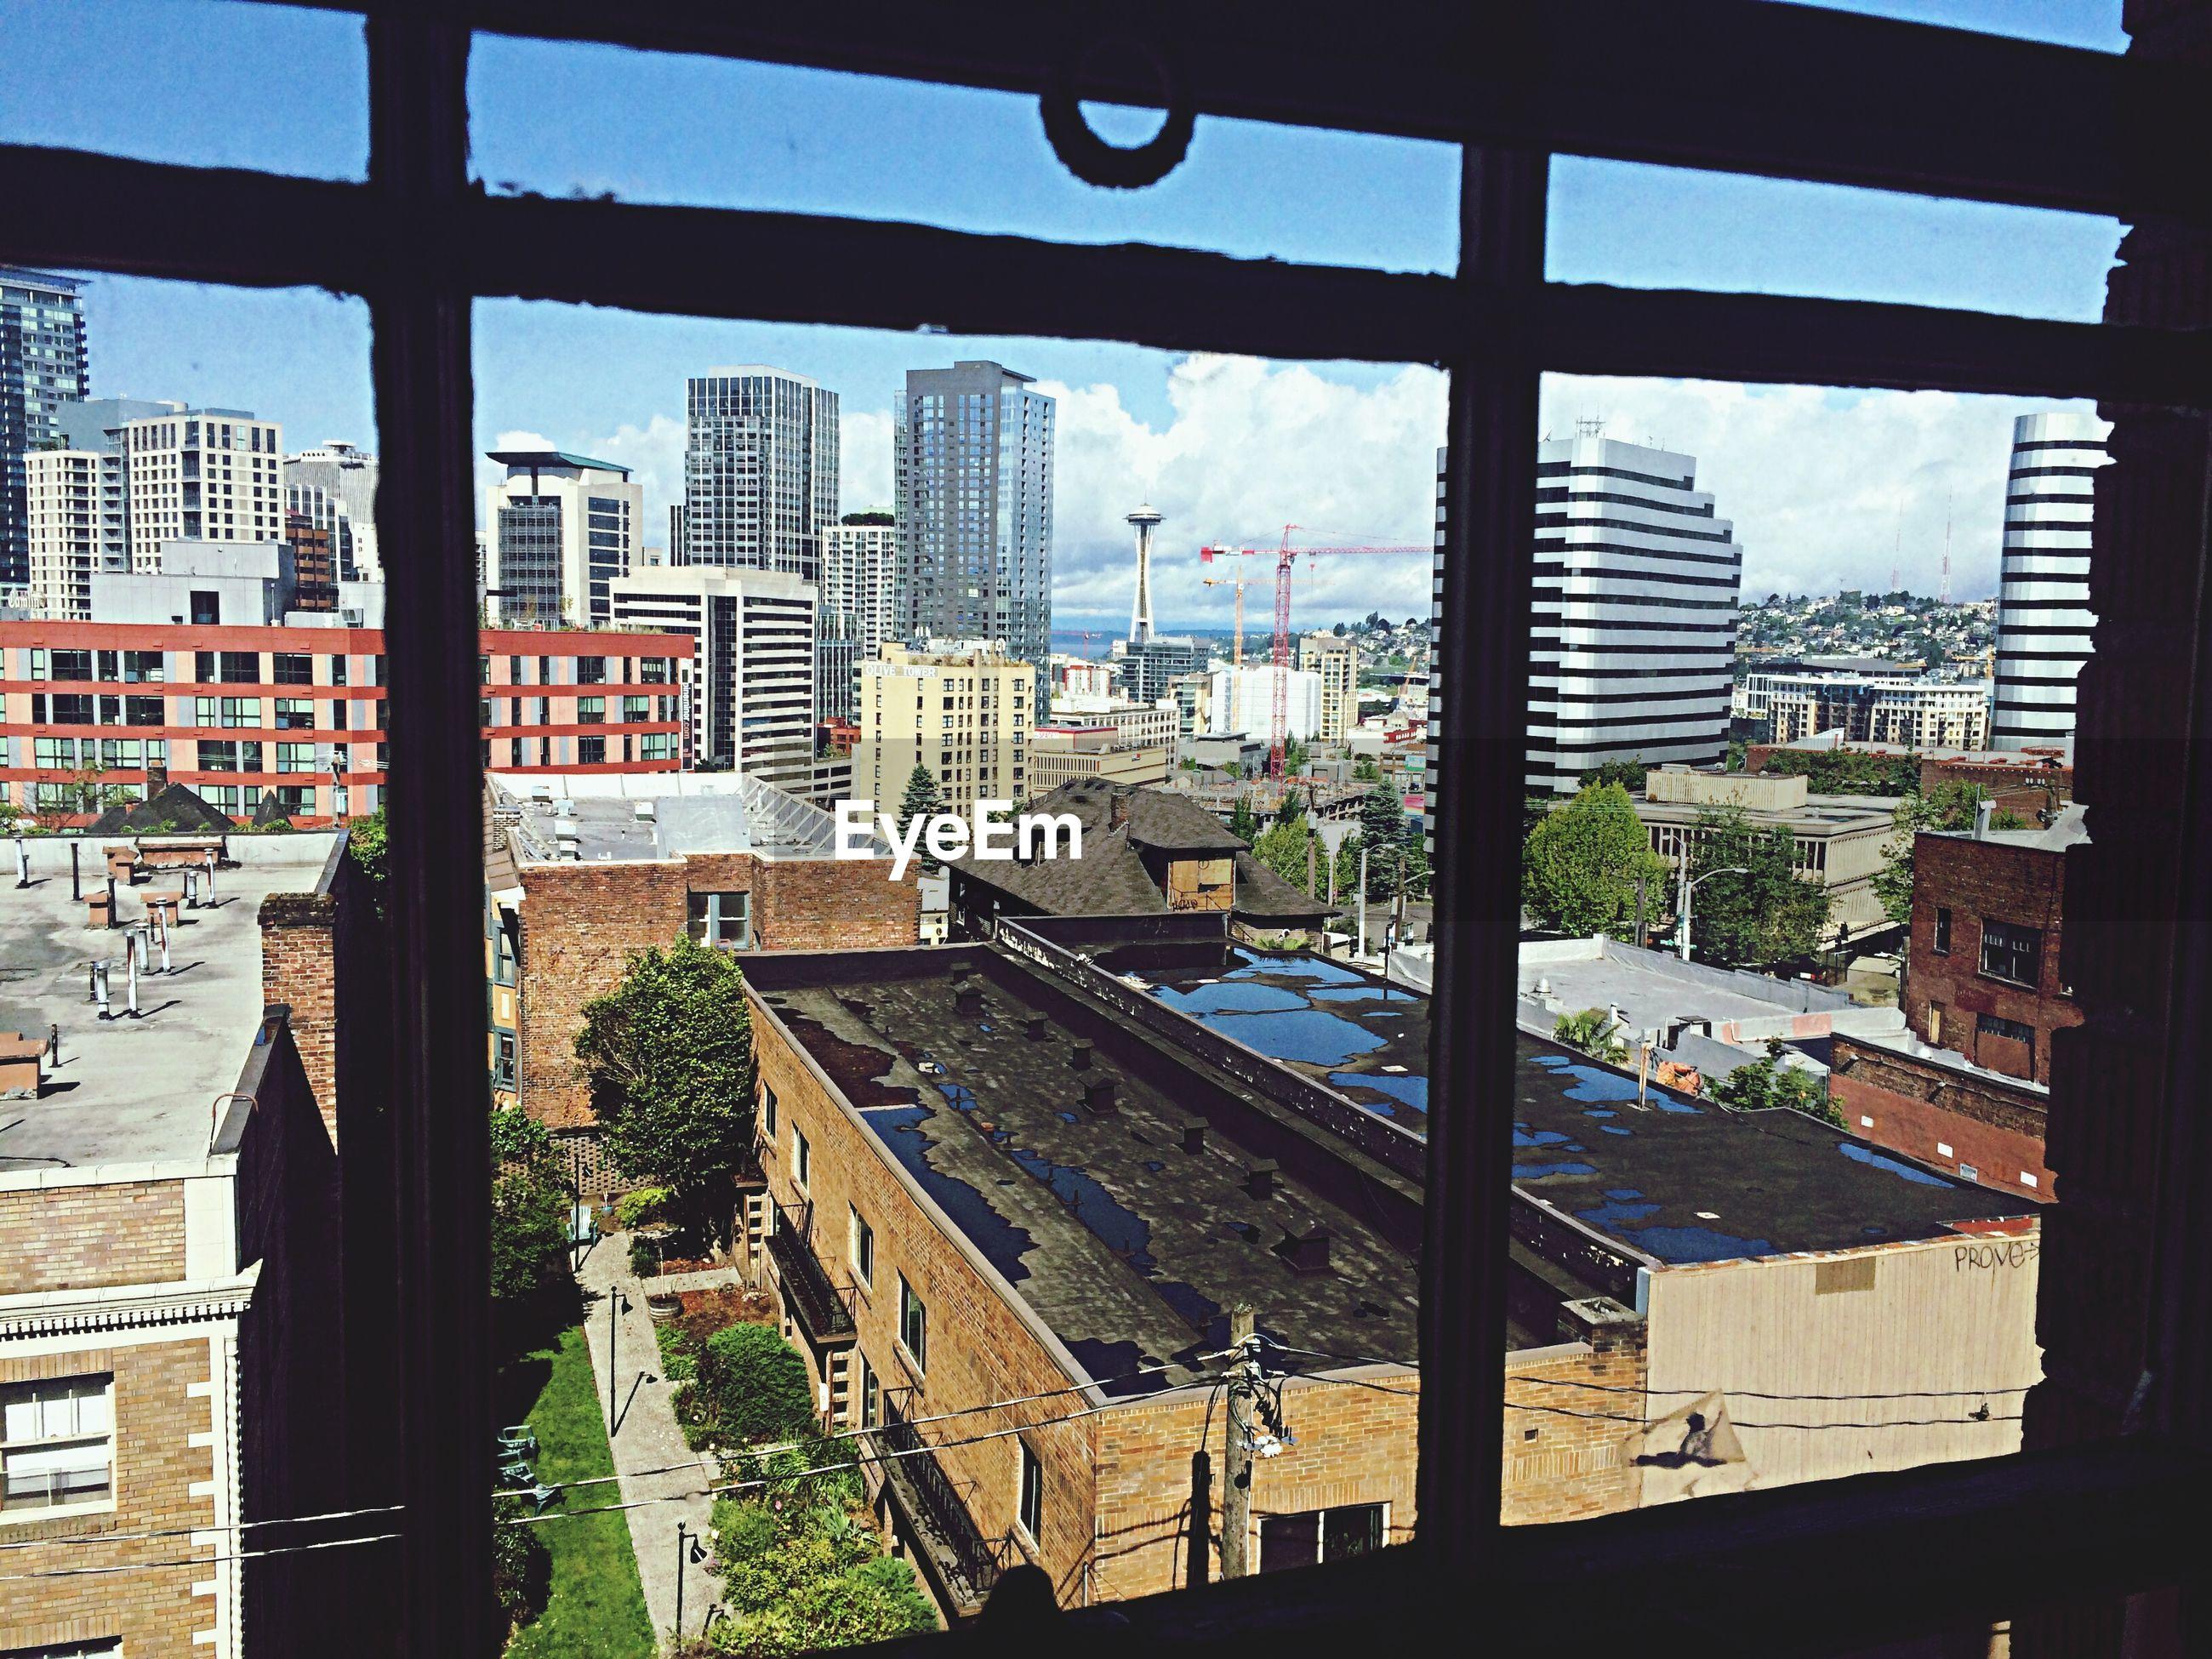 View of buildings against sky through window